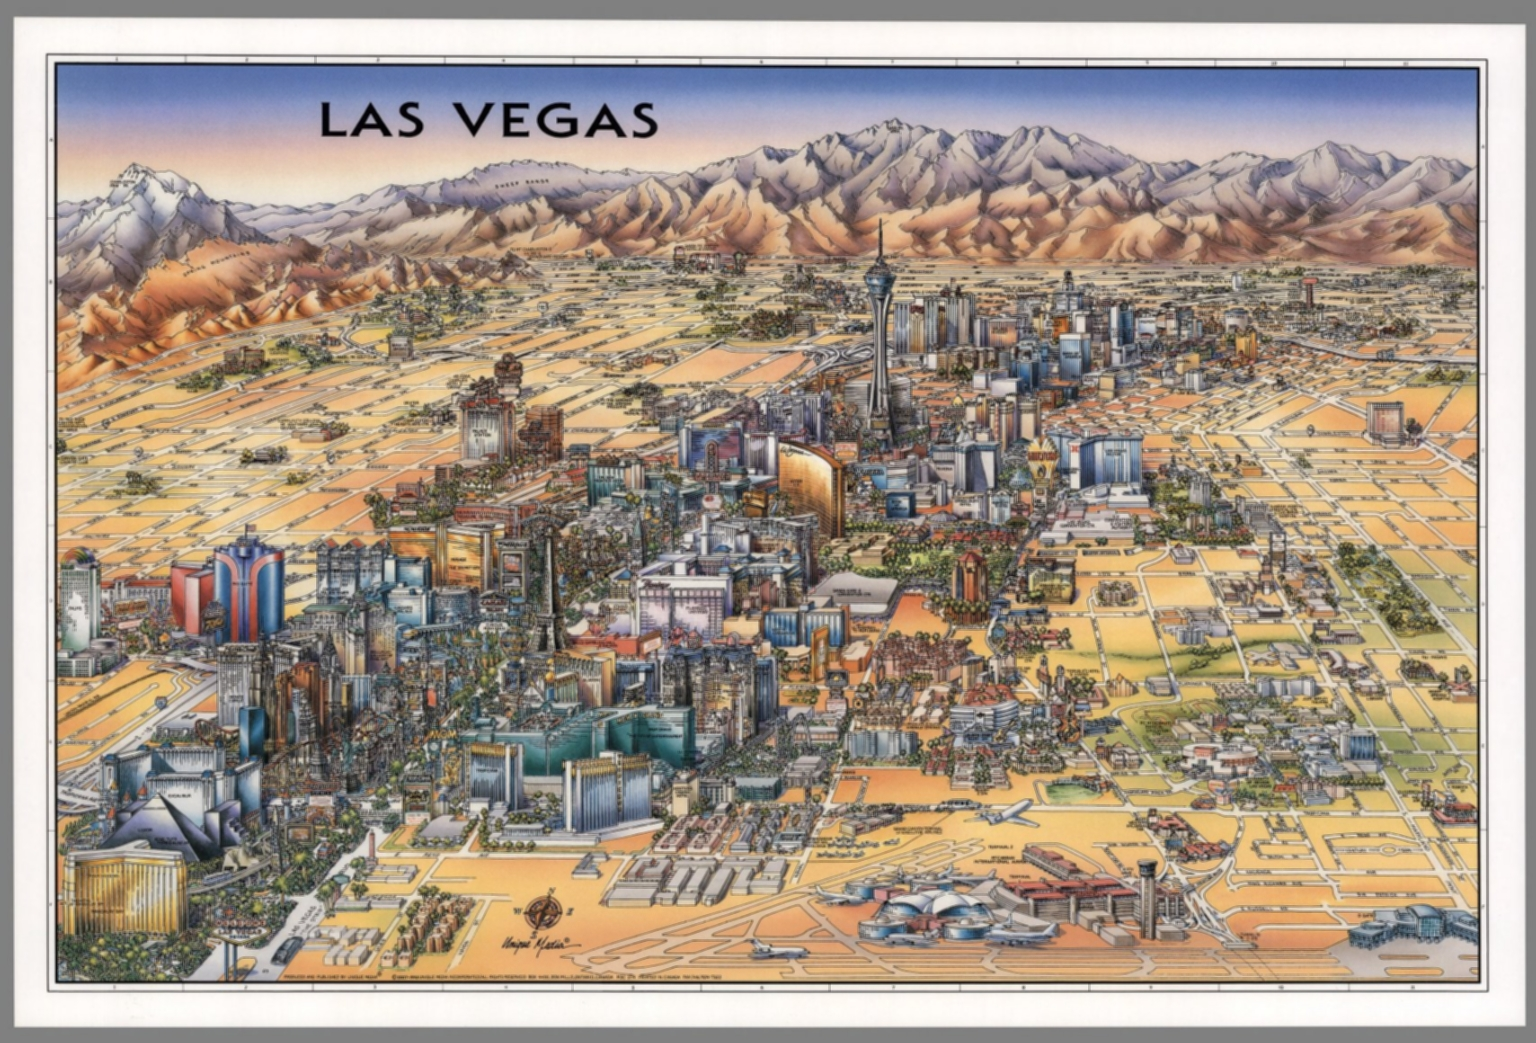 Las Vegas, Nevada. - David Rumsey Historical Map Collection